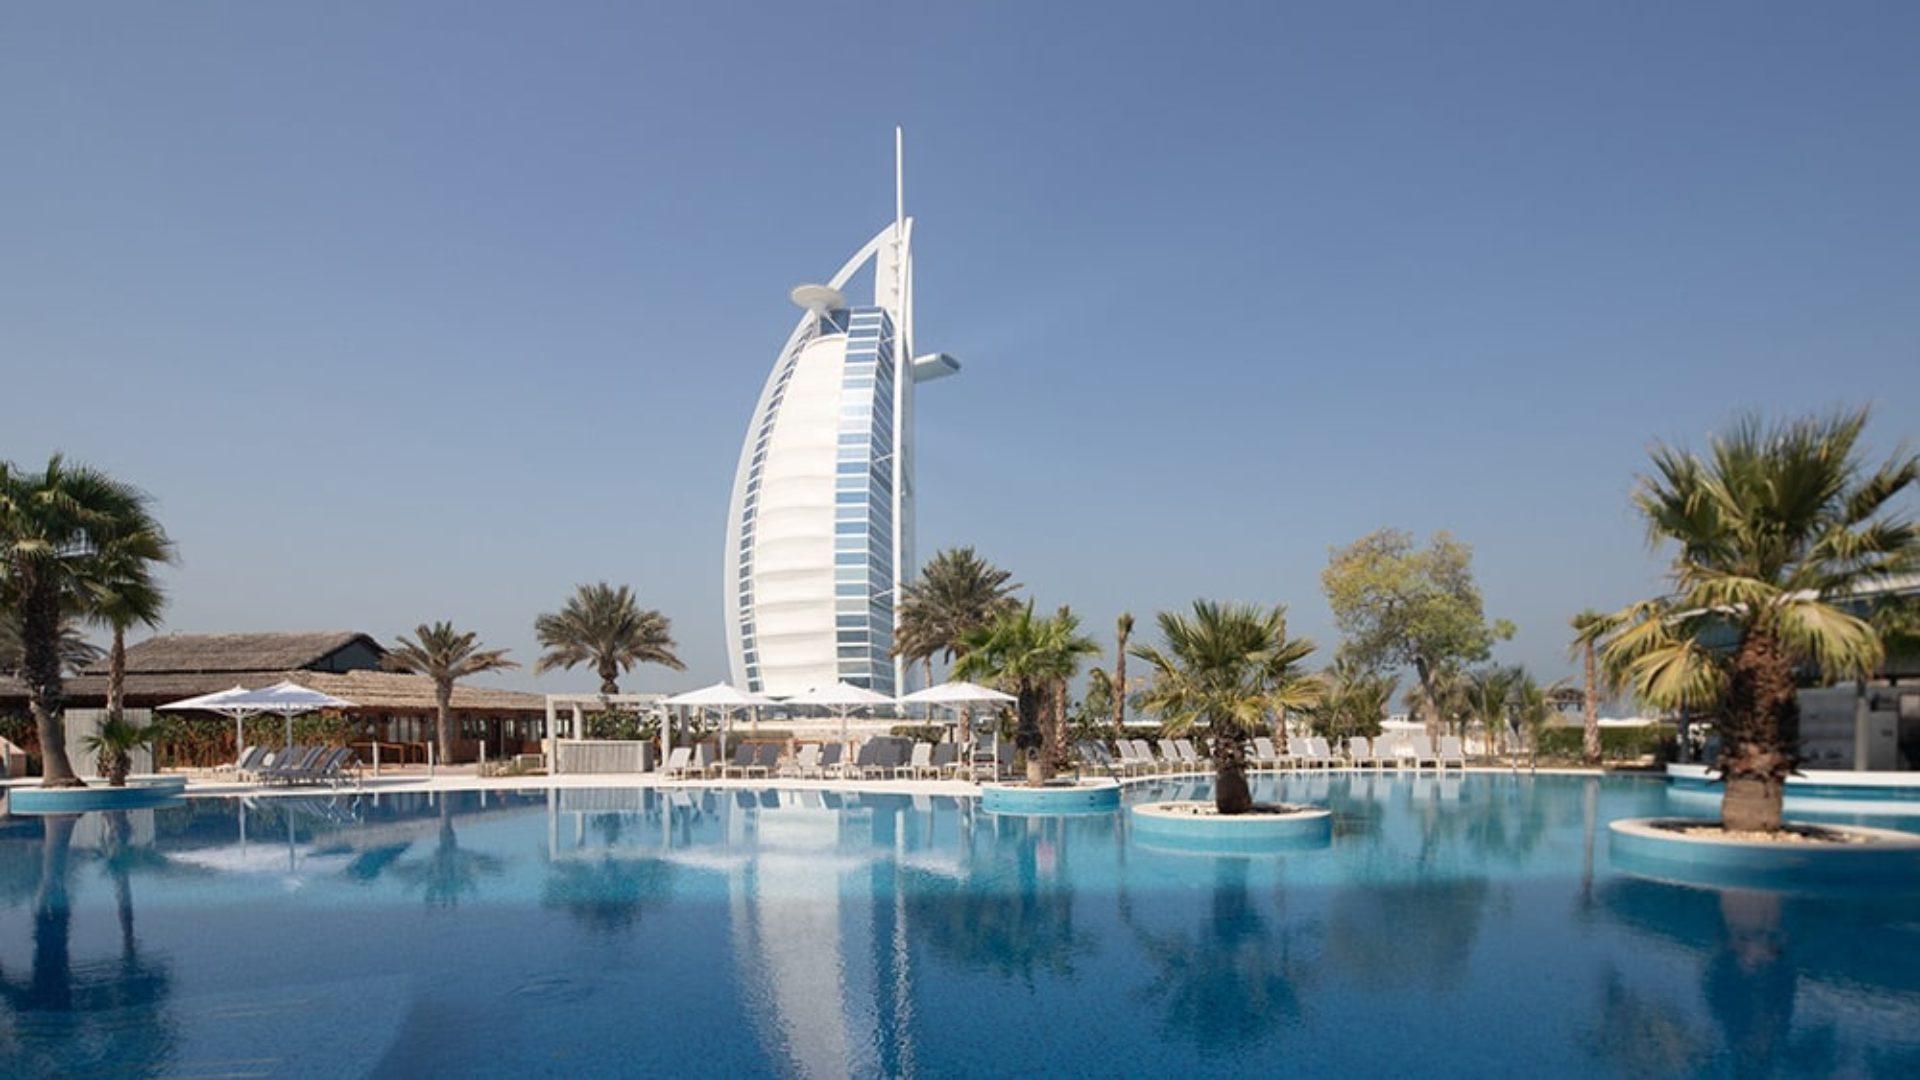 Leisure pool with view of Burj Al Arab at Jumeirah Beach Hotel